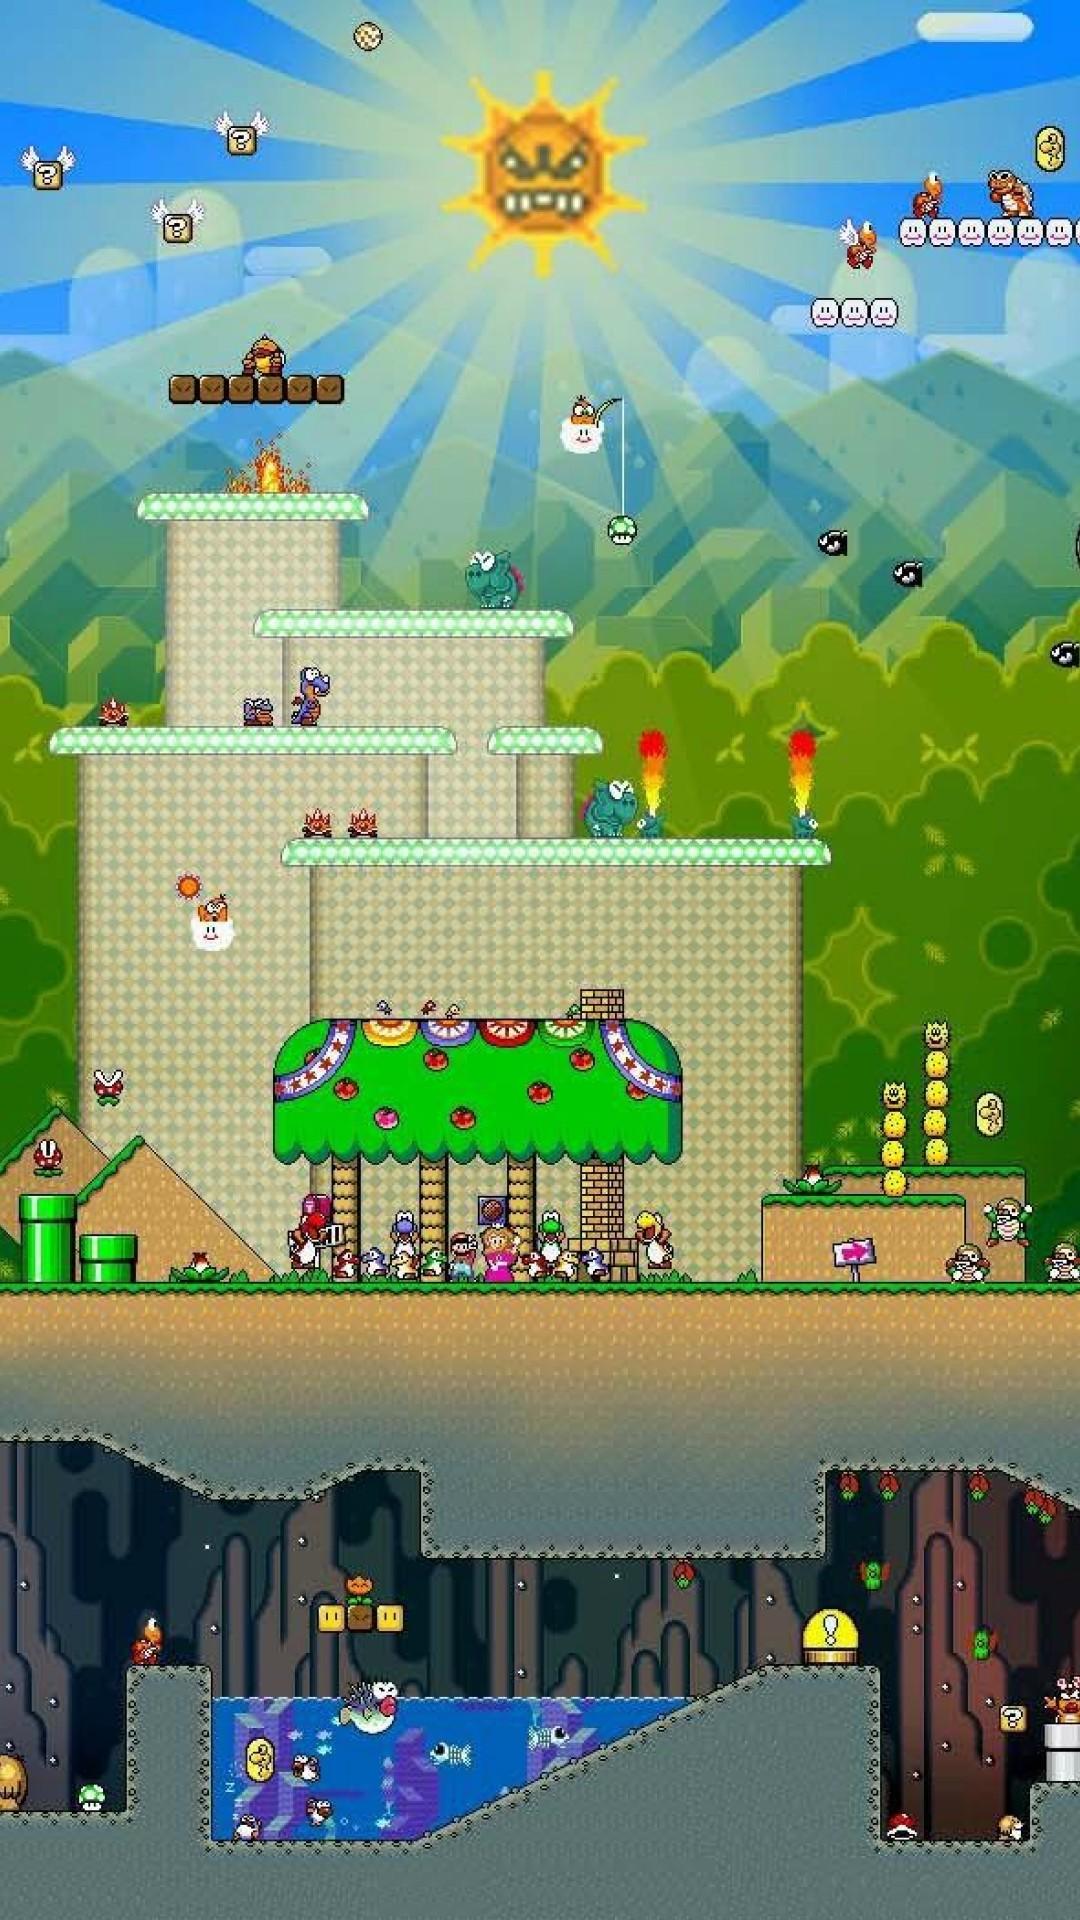 Super Mario World Remake Hd Wallpaper Iphone 6 6s Plus Hd